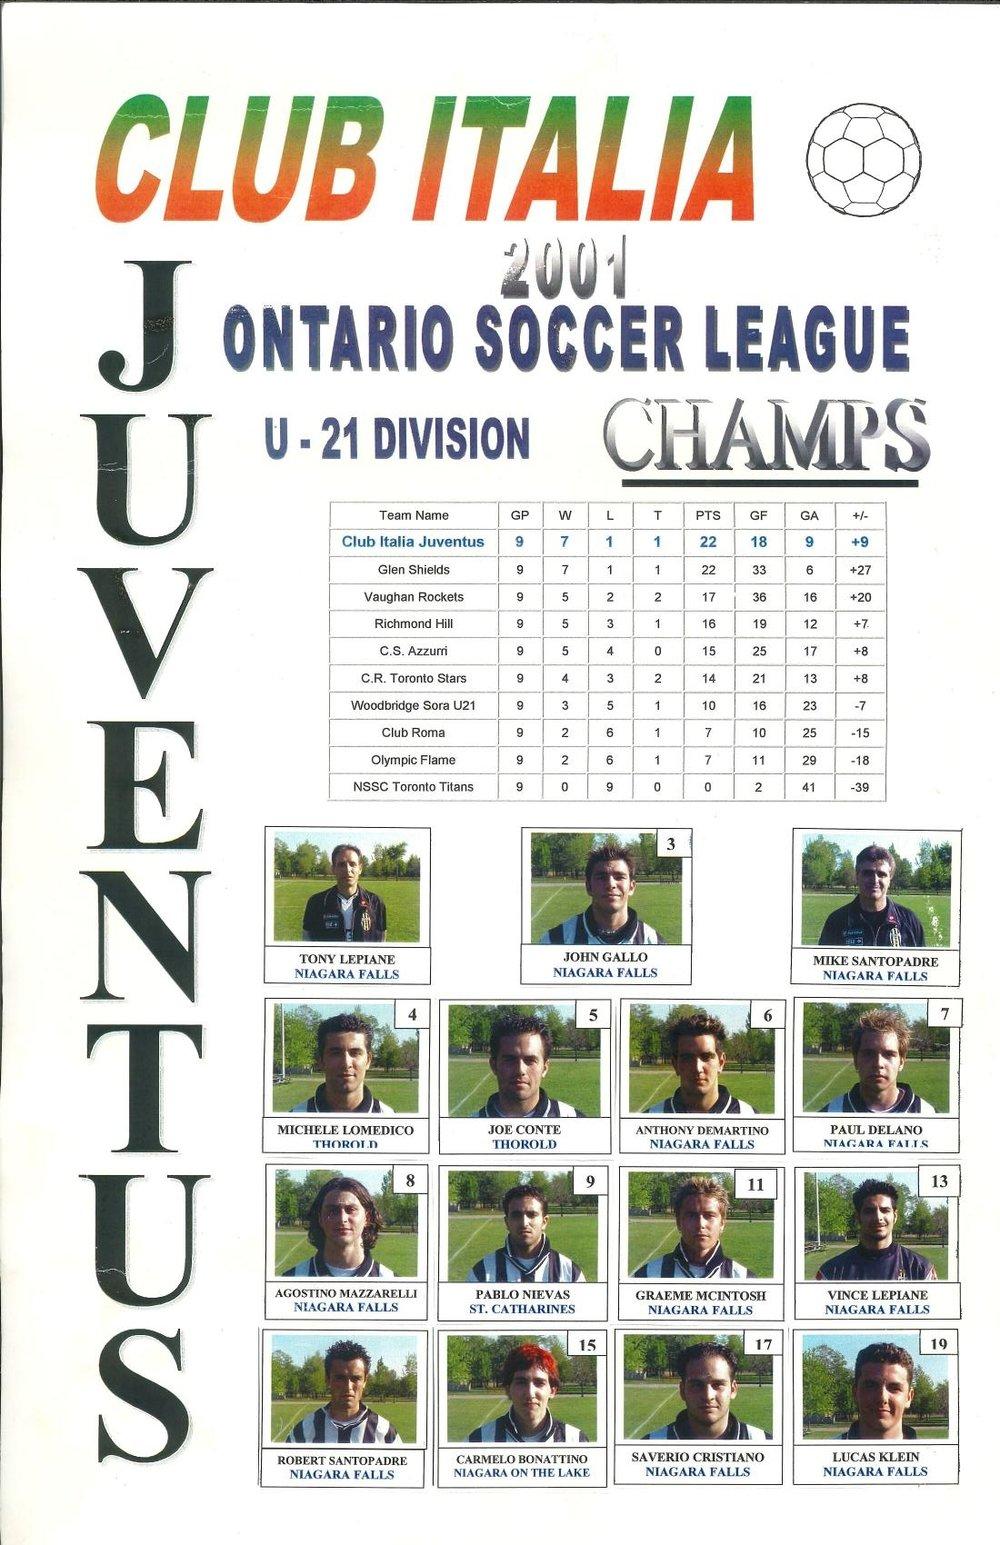 2001 OSL Champs.jpg